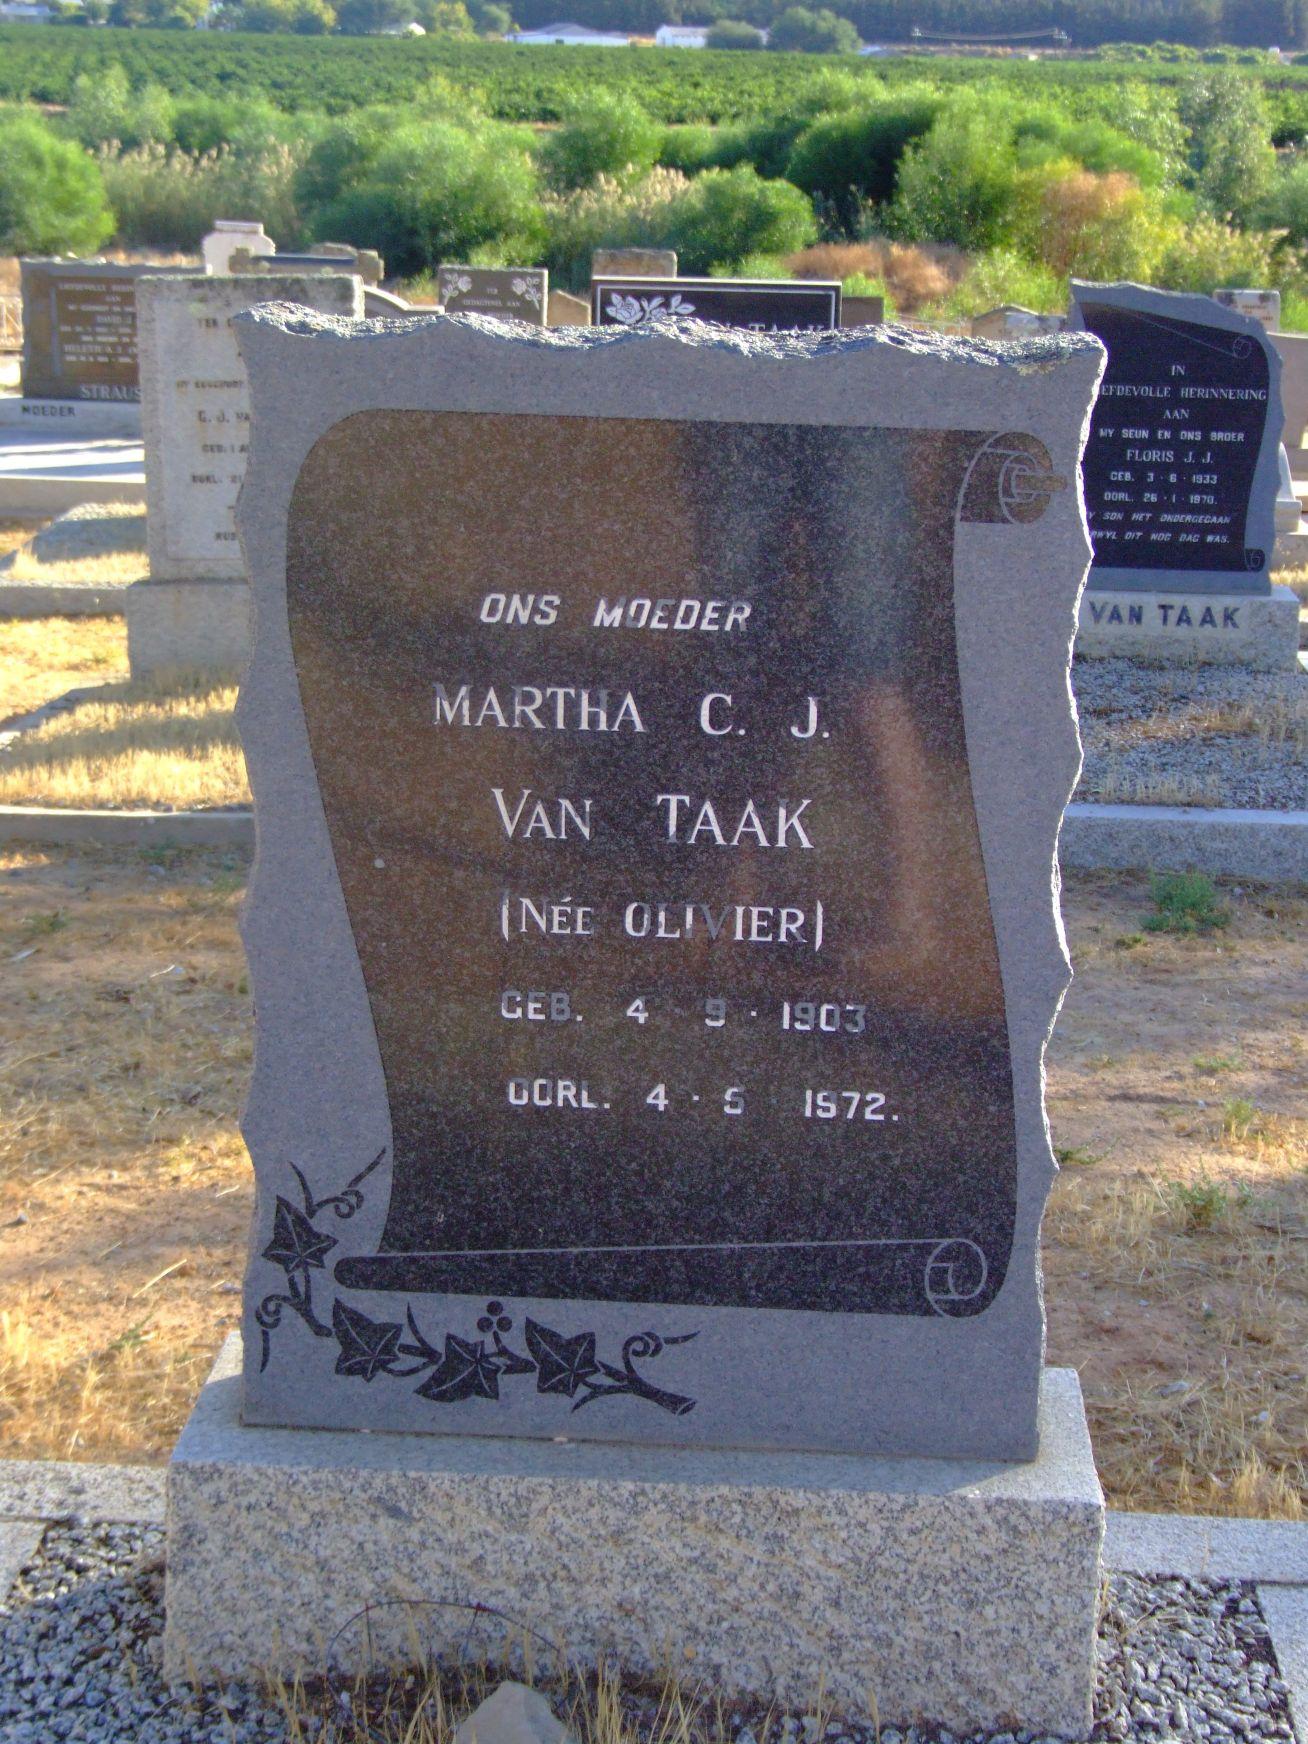 Van Taak, Martha C. J.